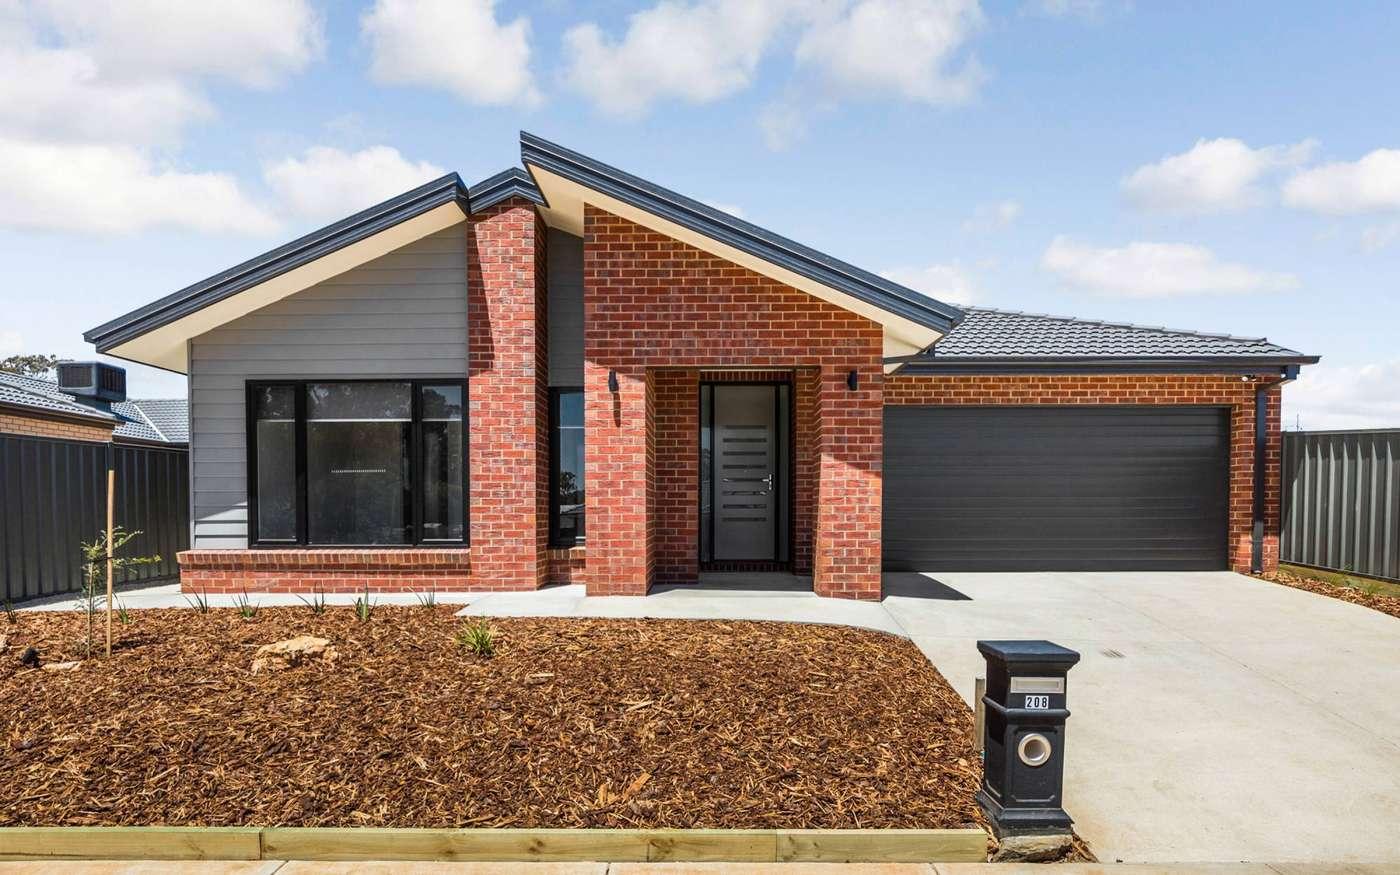 Main view of Homely house listing, LOT 208 Tarrnook Drive, Strathfieldsaye, VIC 3551